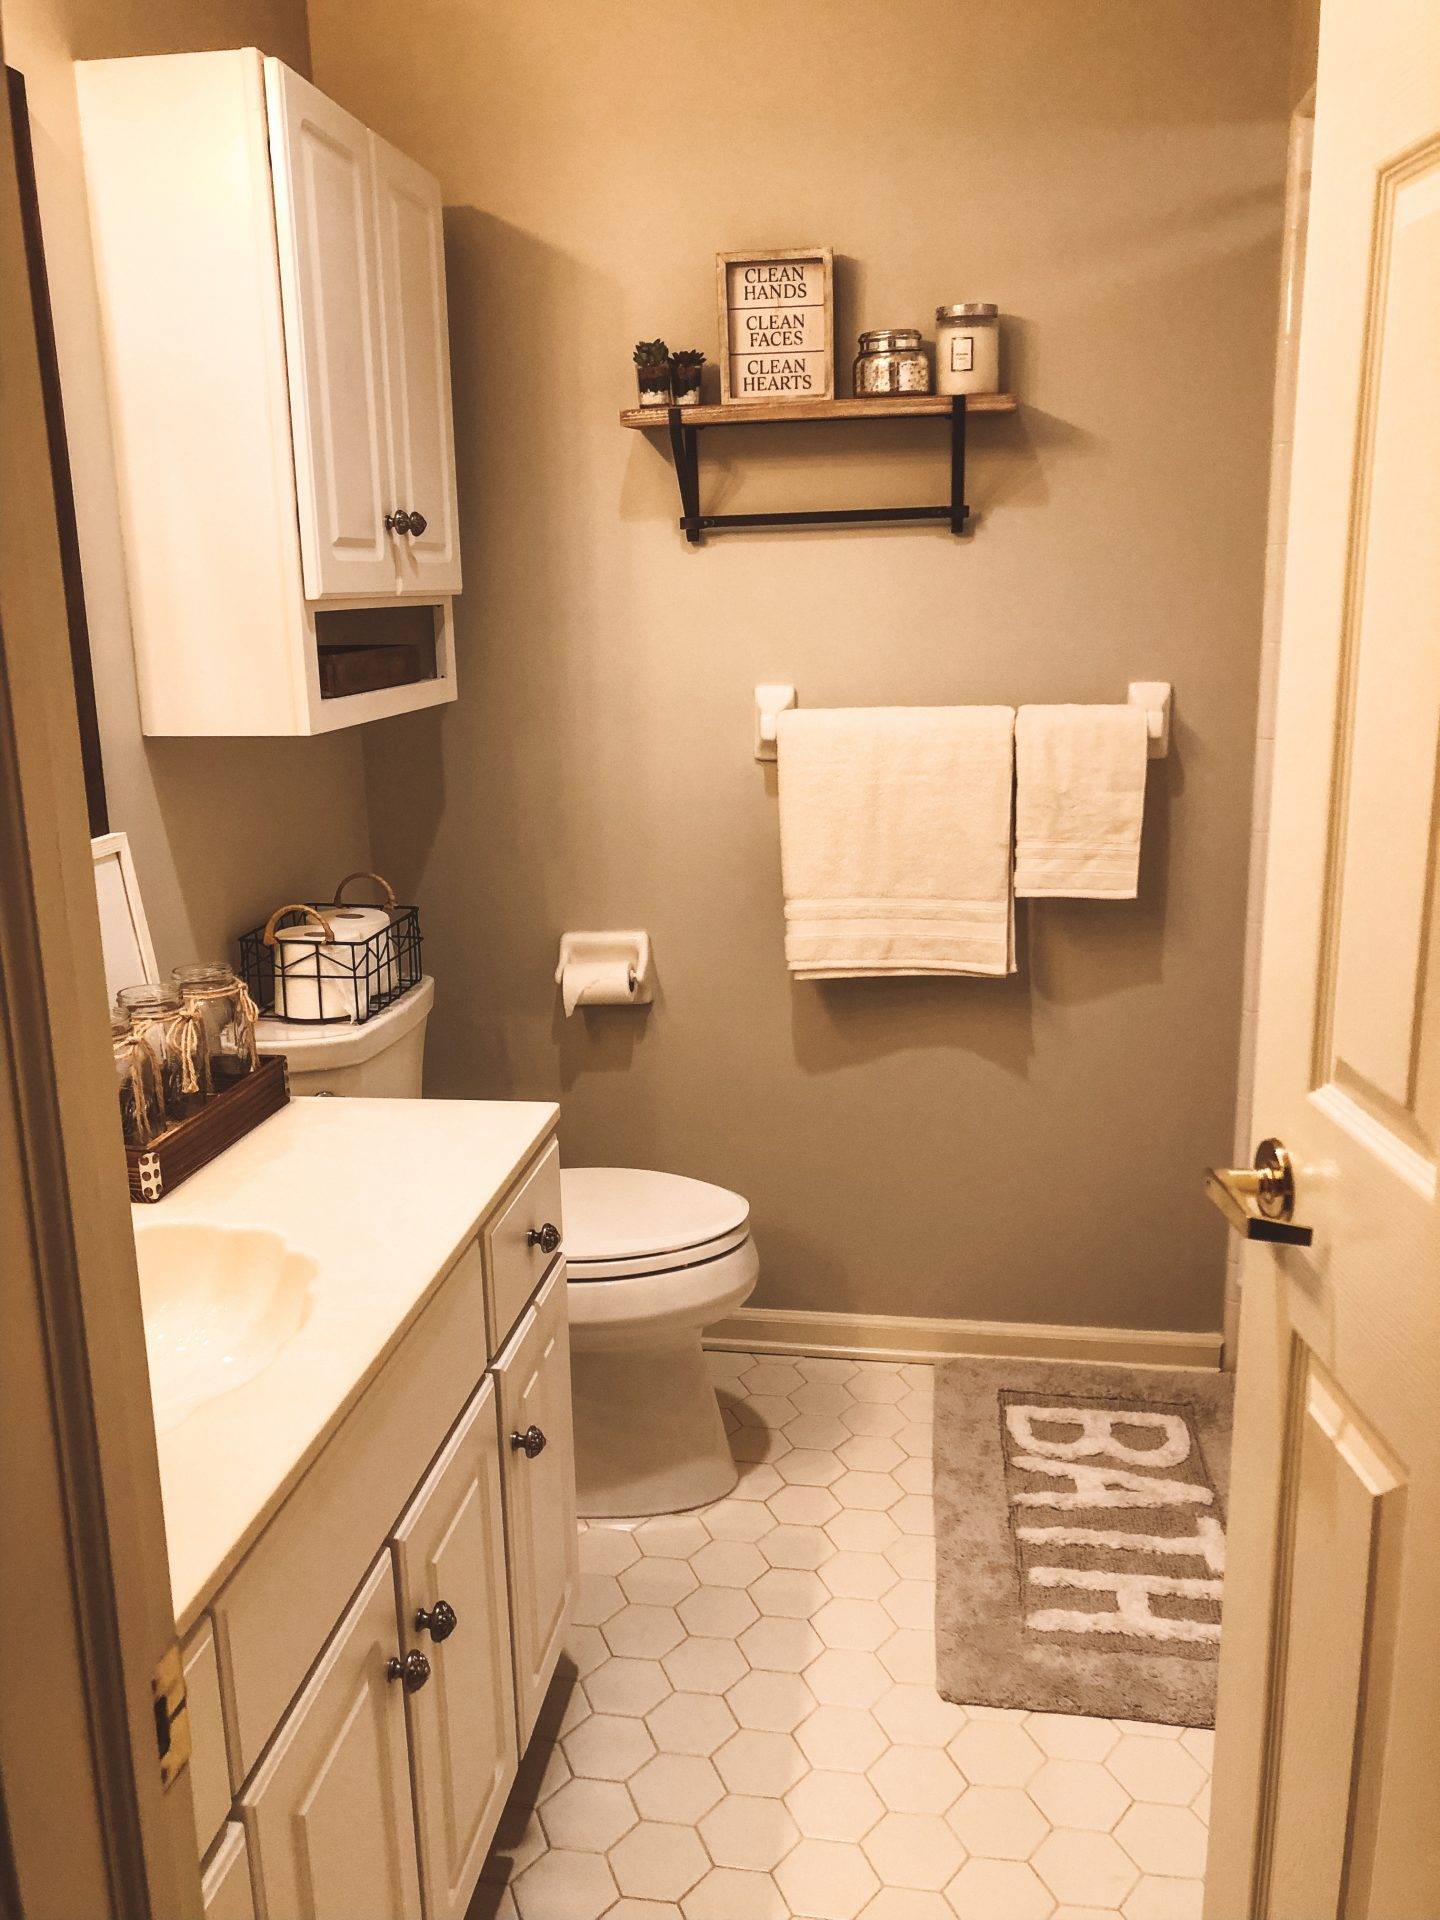 Bathroom Revamp on a Budget!